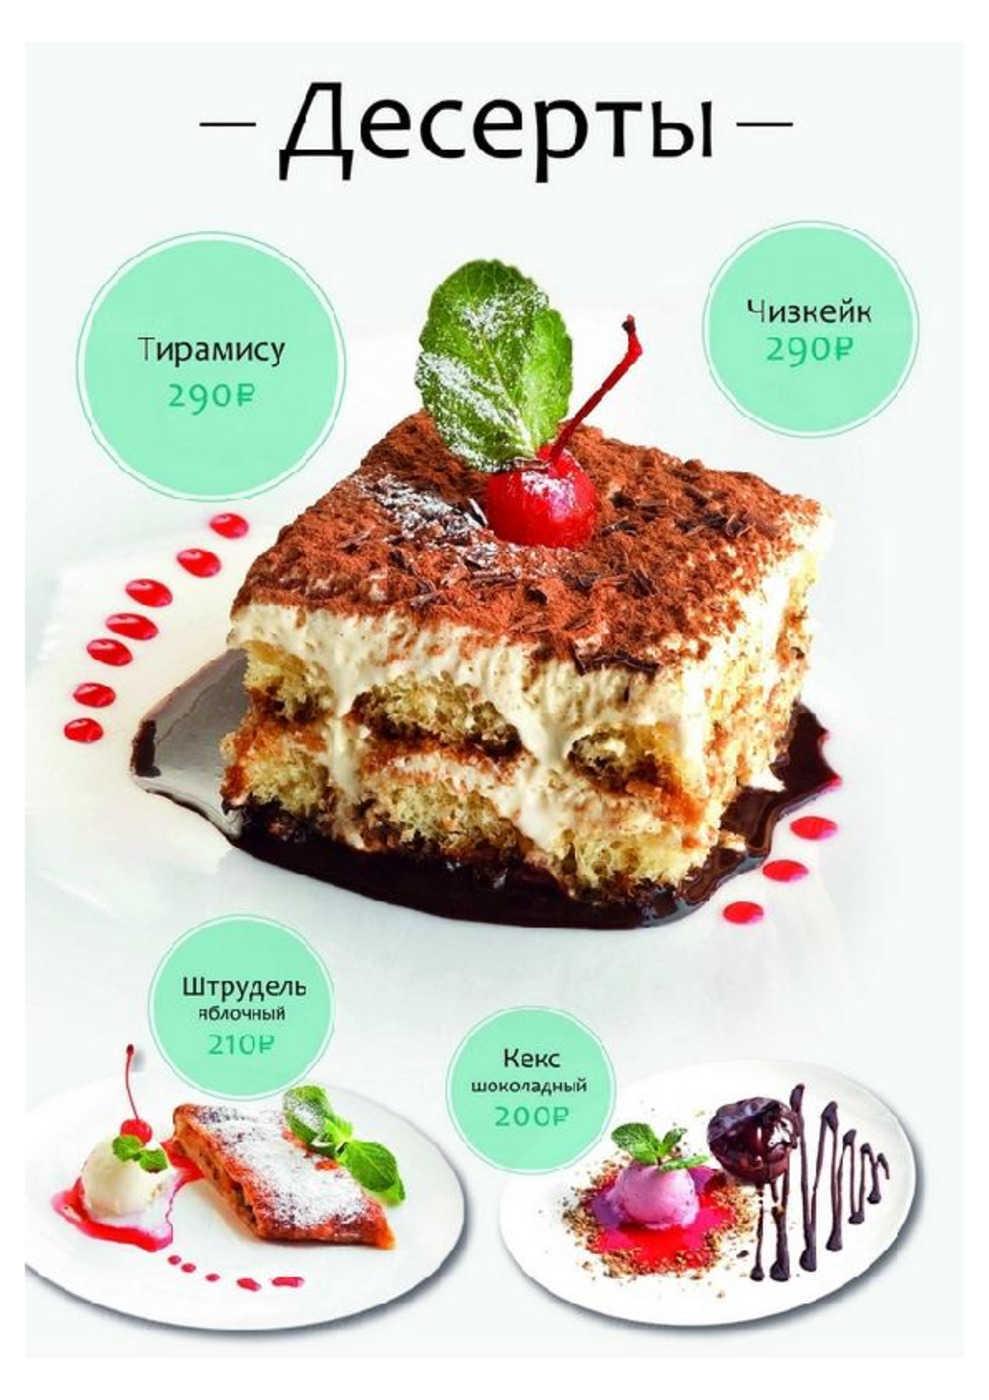 Меню ресторана Любимый Хабиб на проспекте Стачек фото 50